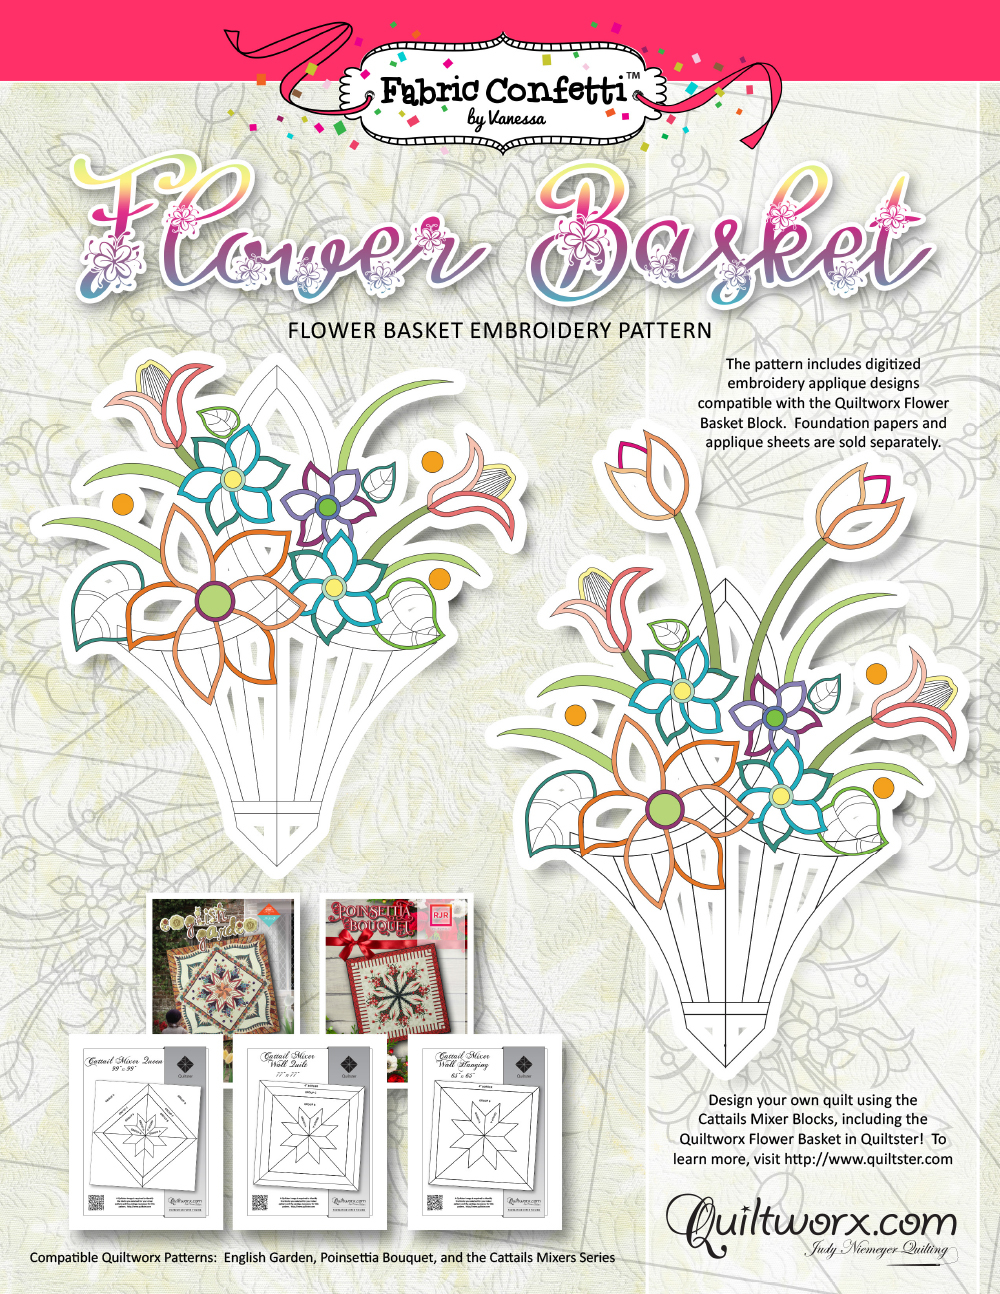 Embroidery Machine Patterns Download Flower Basket Embroidery Pattern Digital Download